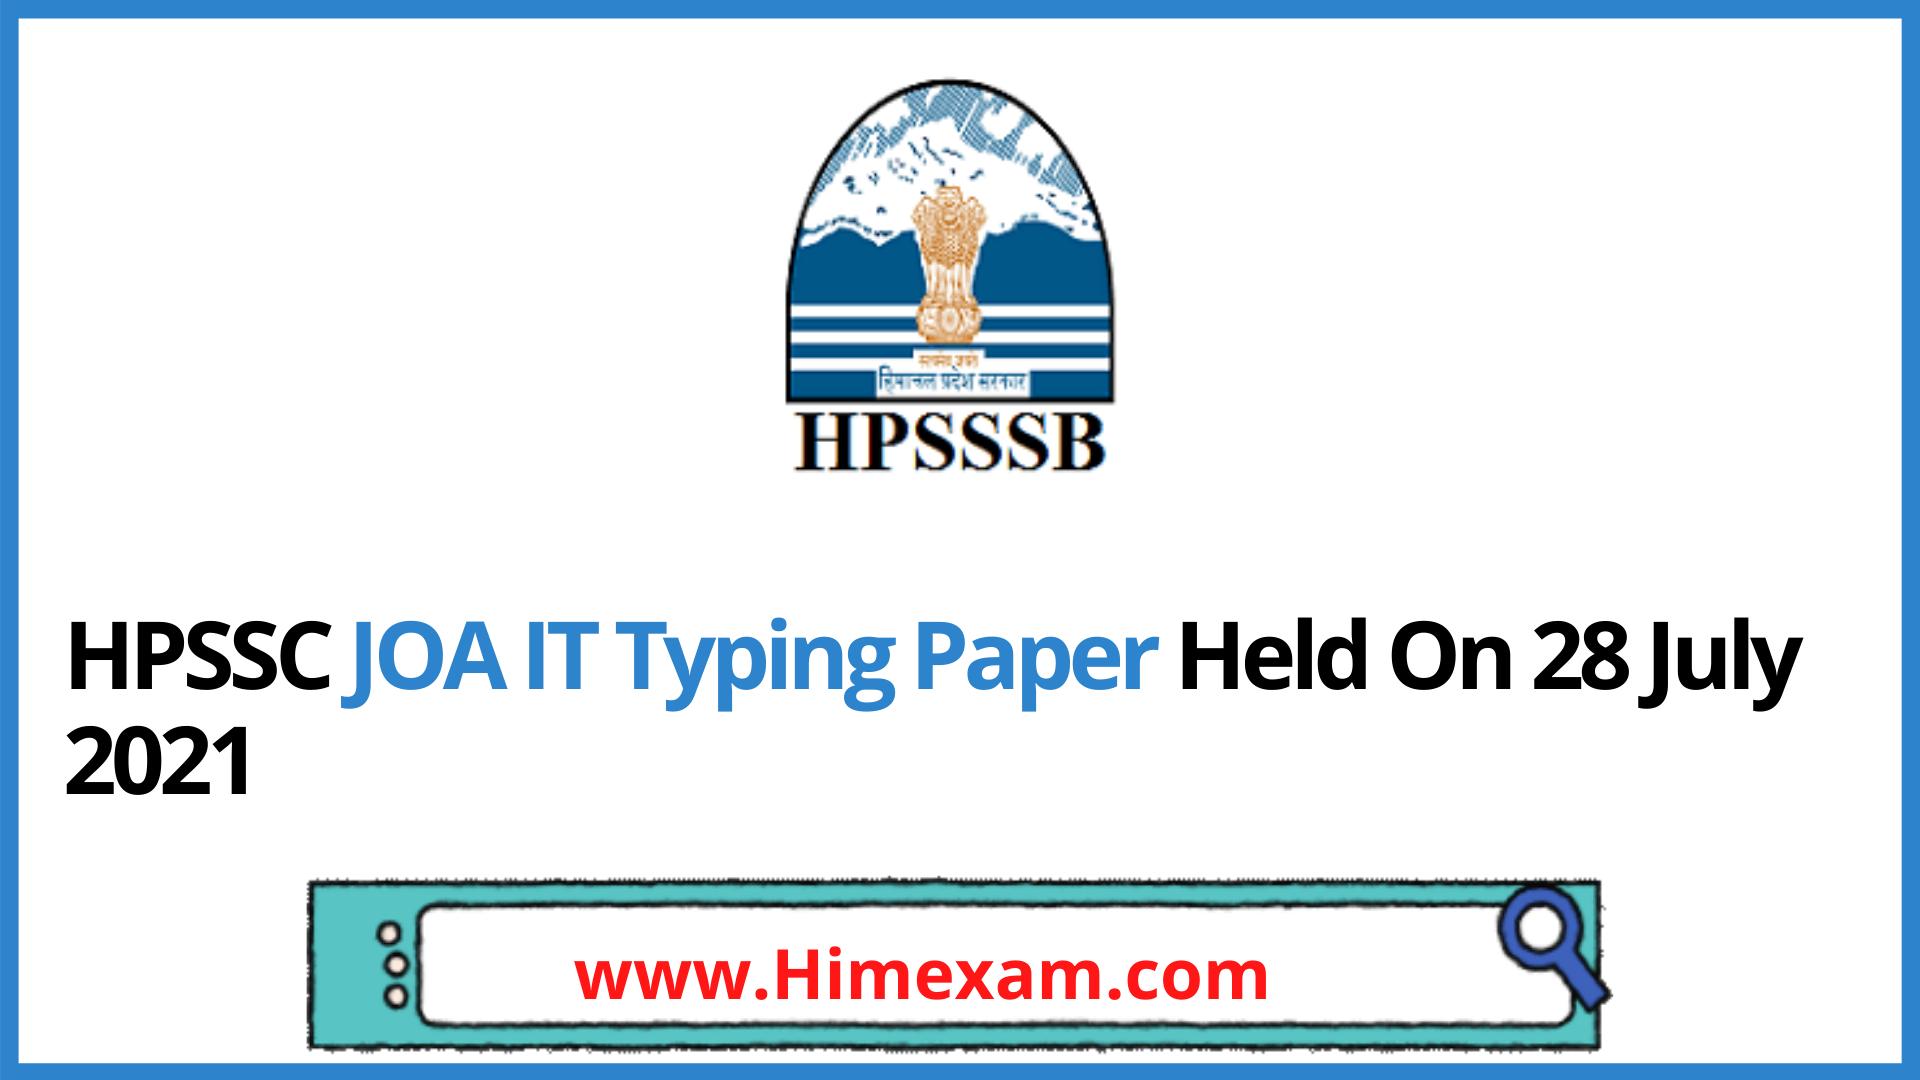 HPSSC JOA IT Typing Paper Held On 28 July 2021